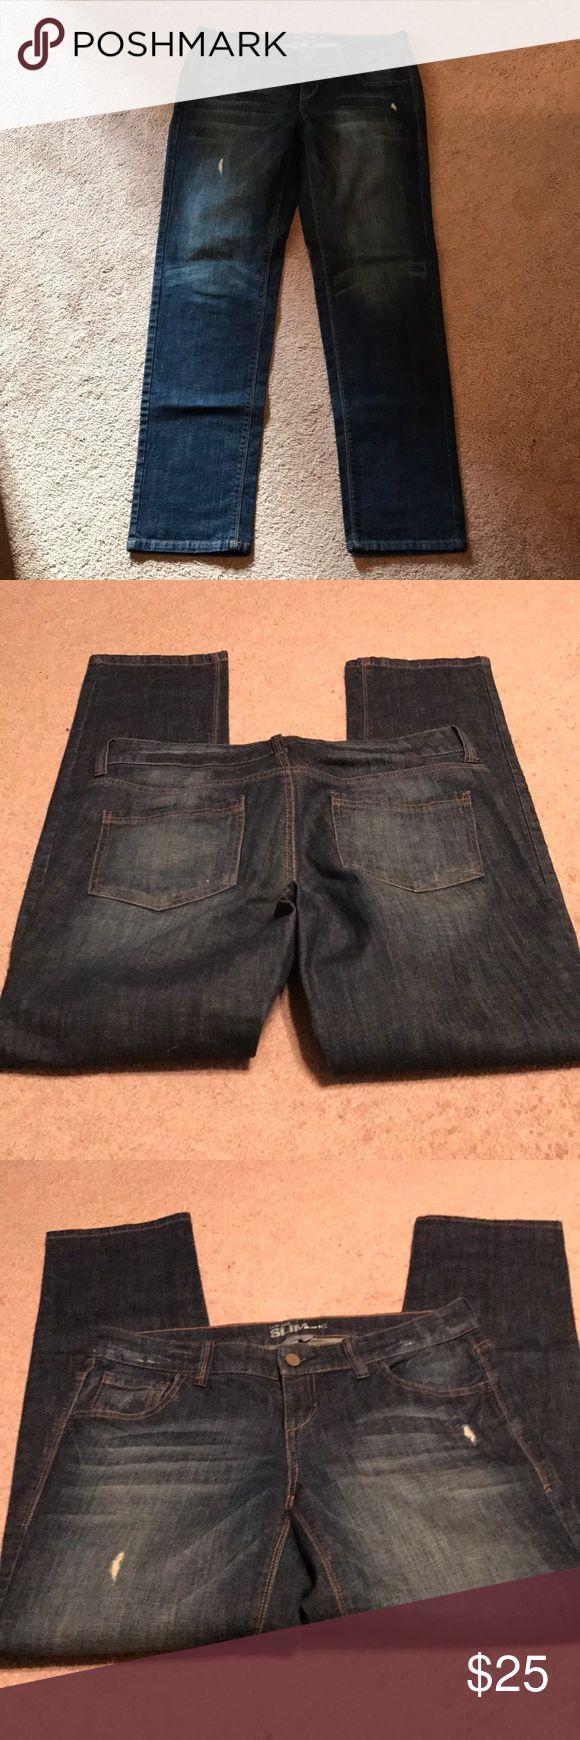 "New York & Co Slouch Jeans Waist 17"", inseam 30.5"", rise 8.5"". Cotton/spandex blend. Light distressing. New York & Company Jeans Boyfriend"